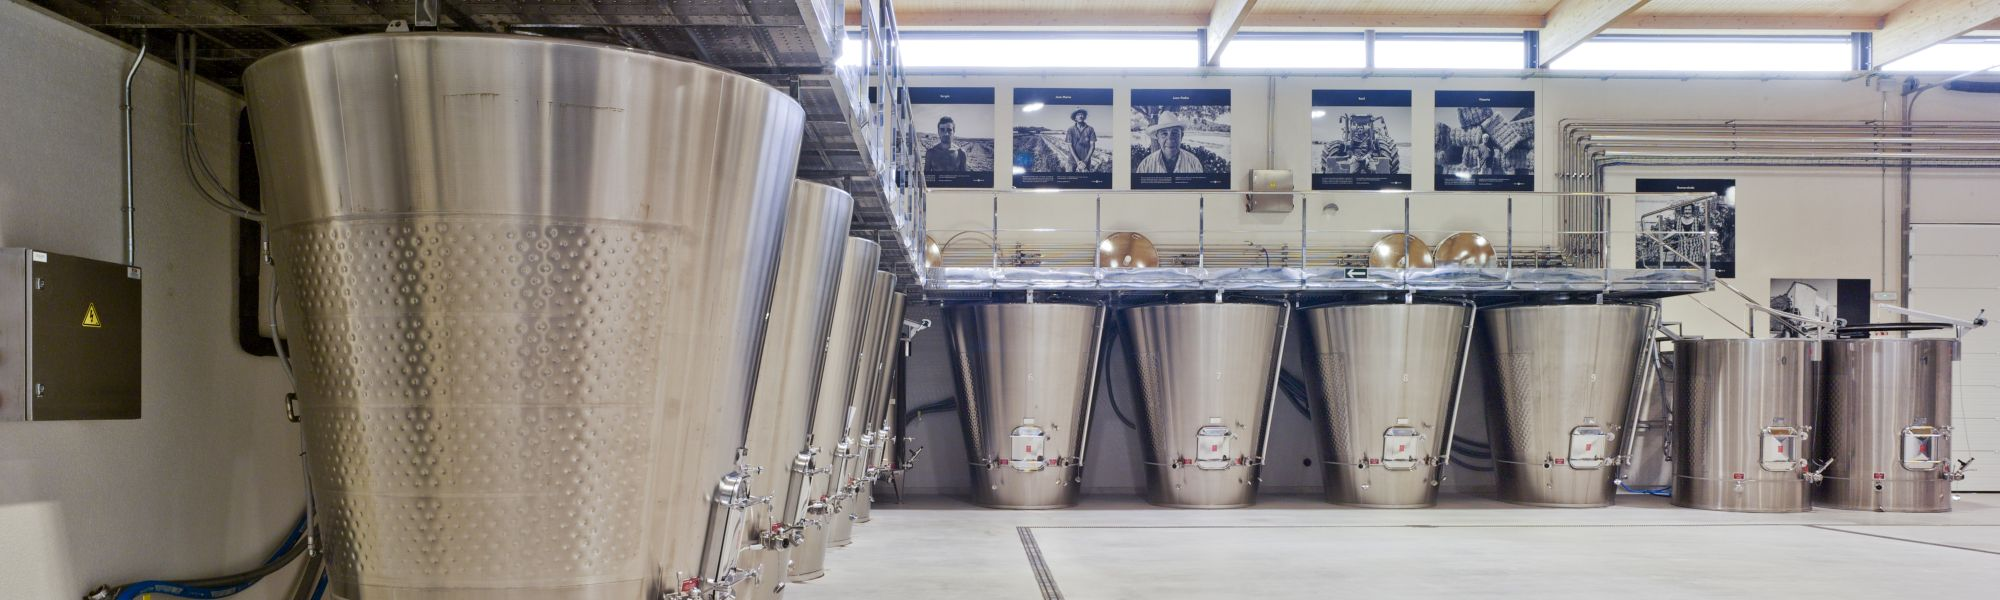 Weingut Casa Rojo Spanien Verarbeitungs Tanks